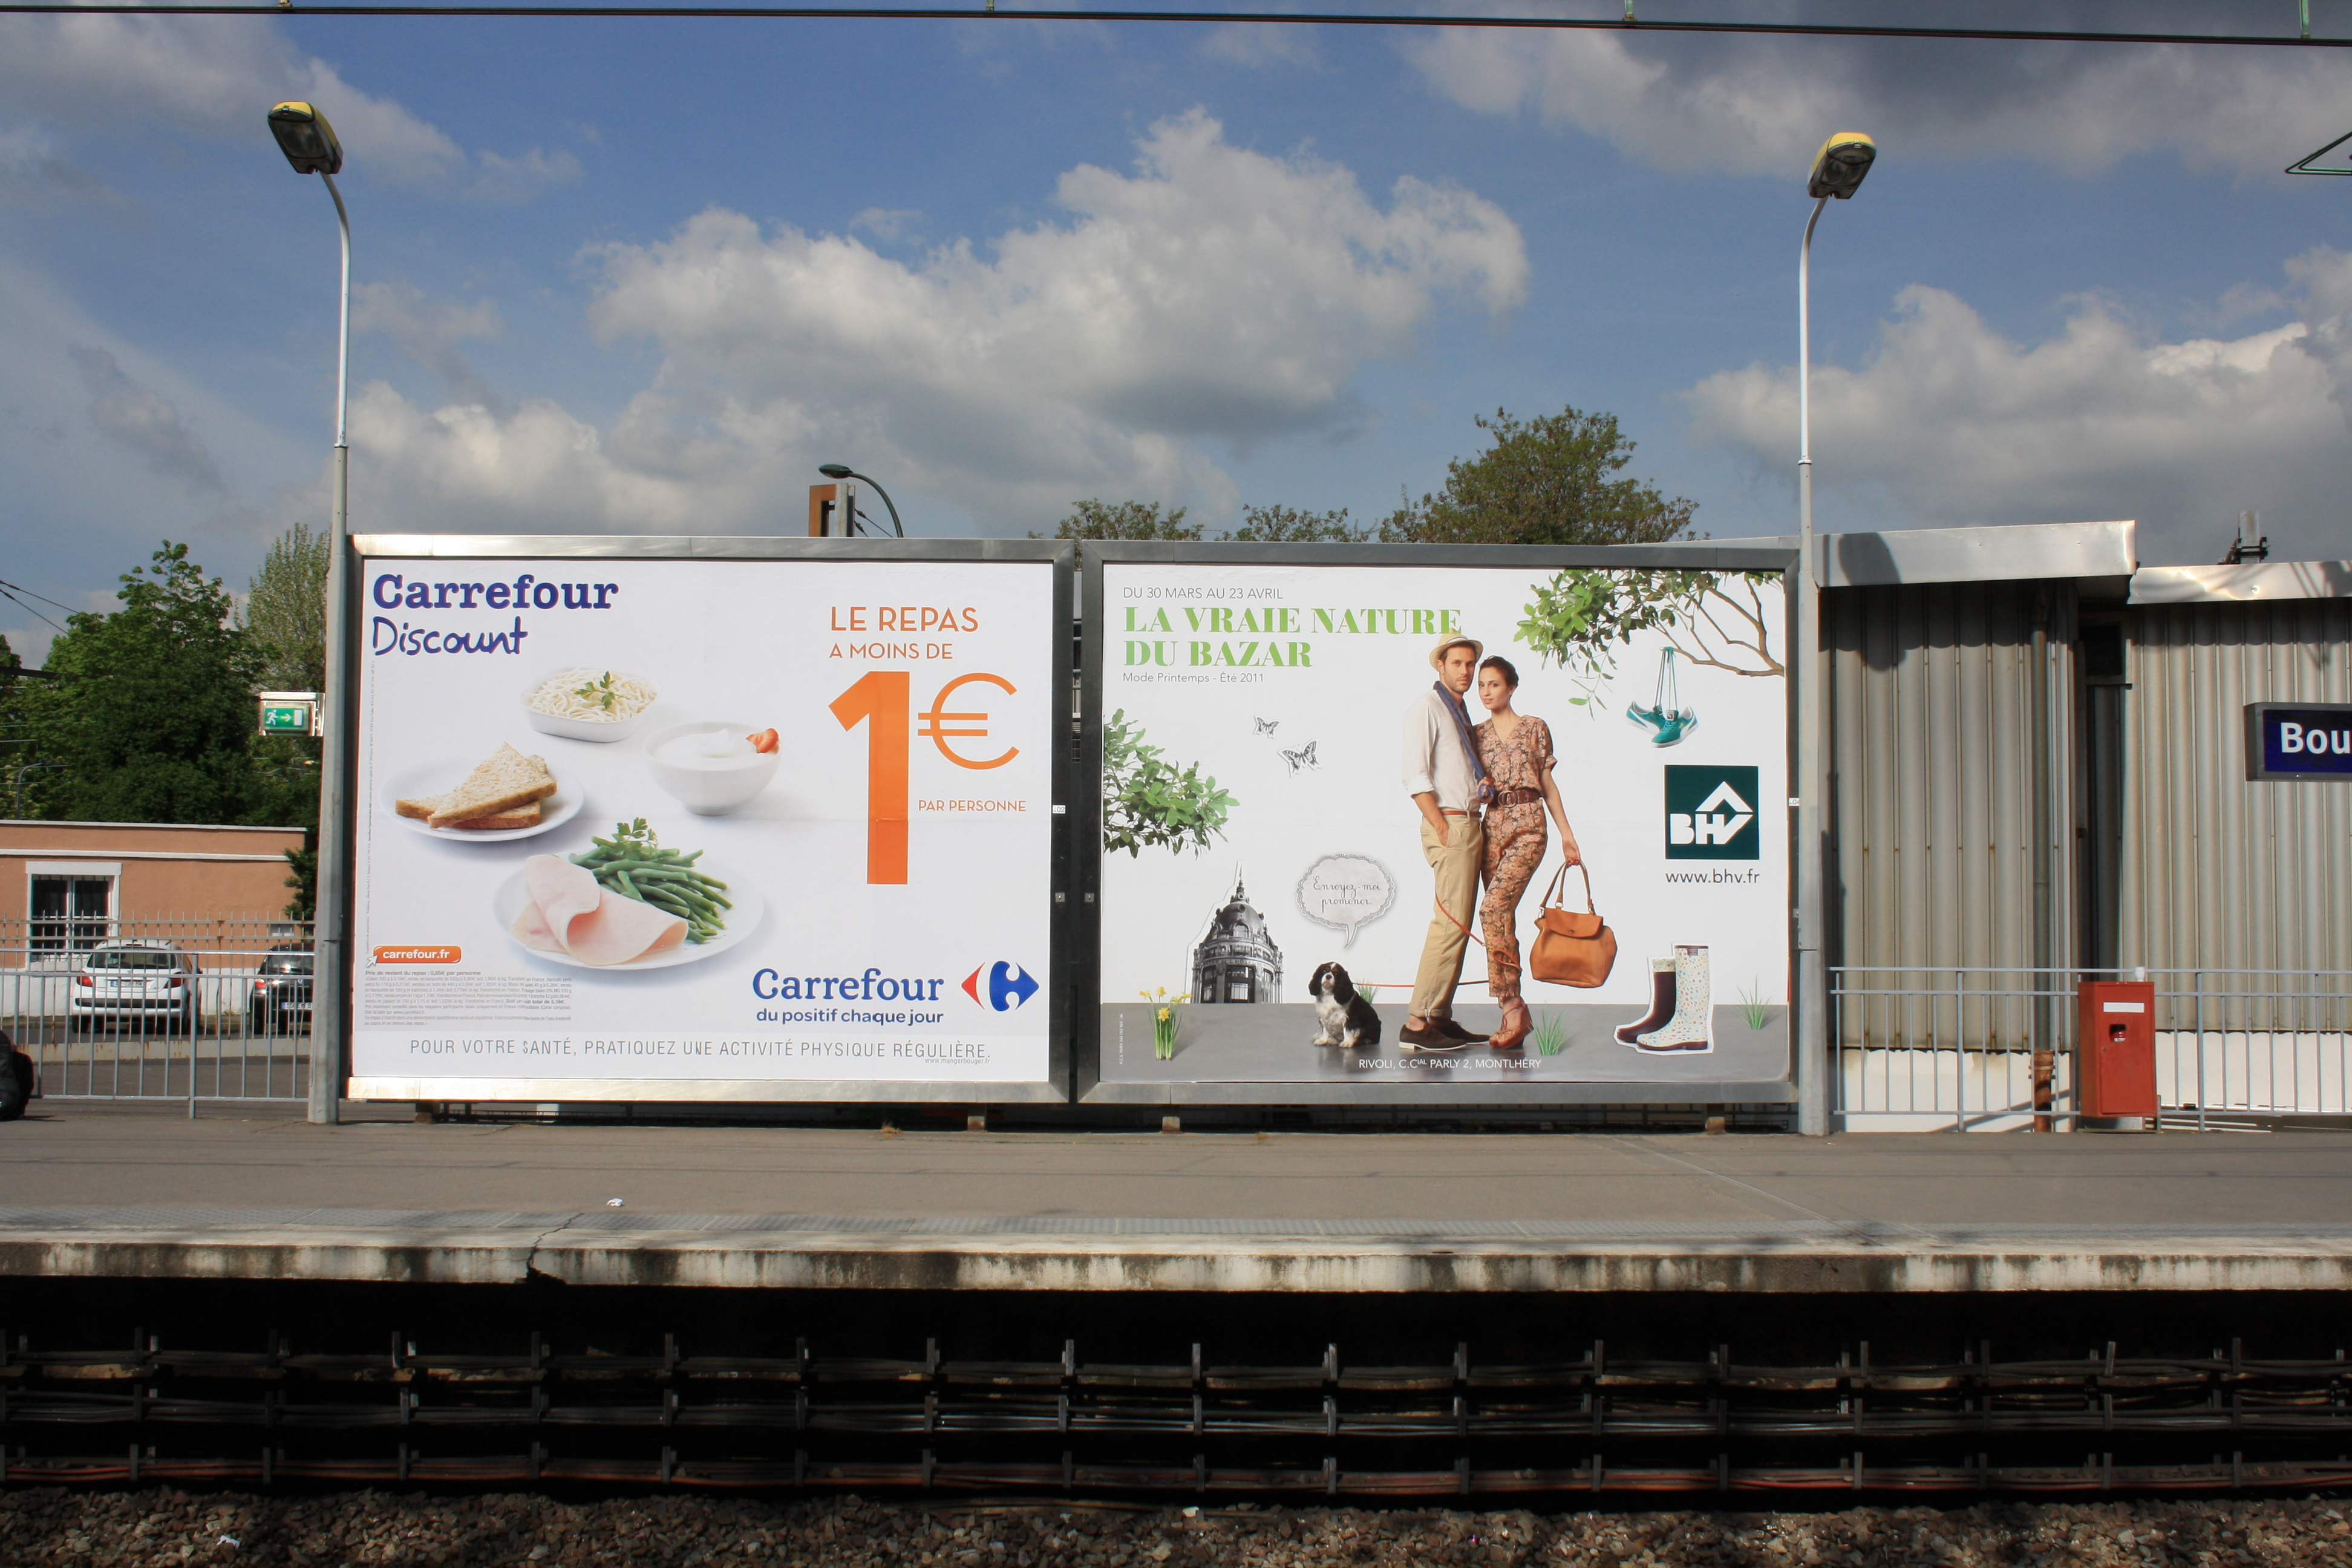 File:Bourg La Reine Railway Station Billboards.jpg - Wikimedia Commons